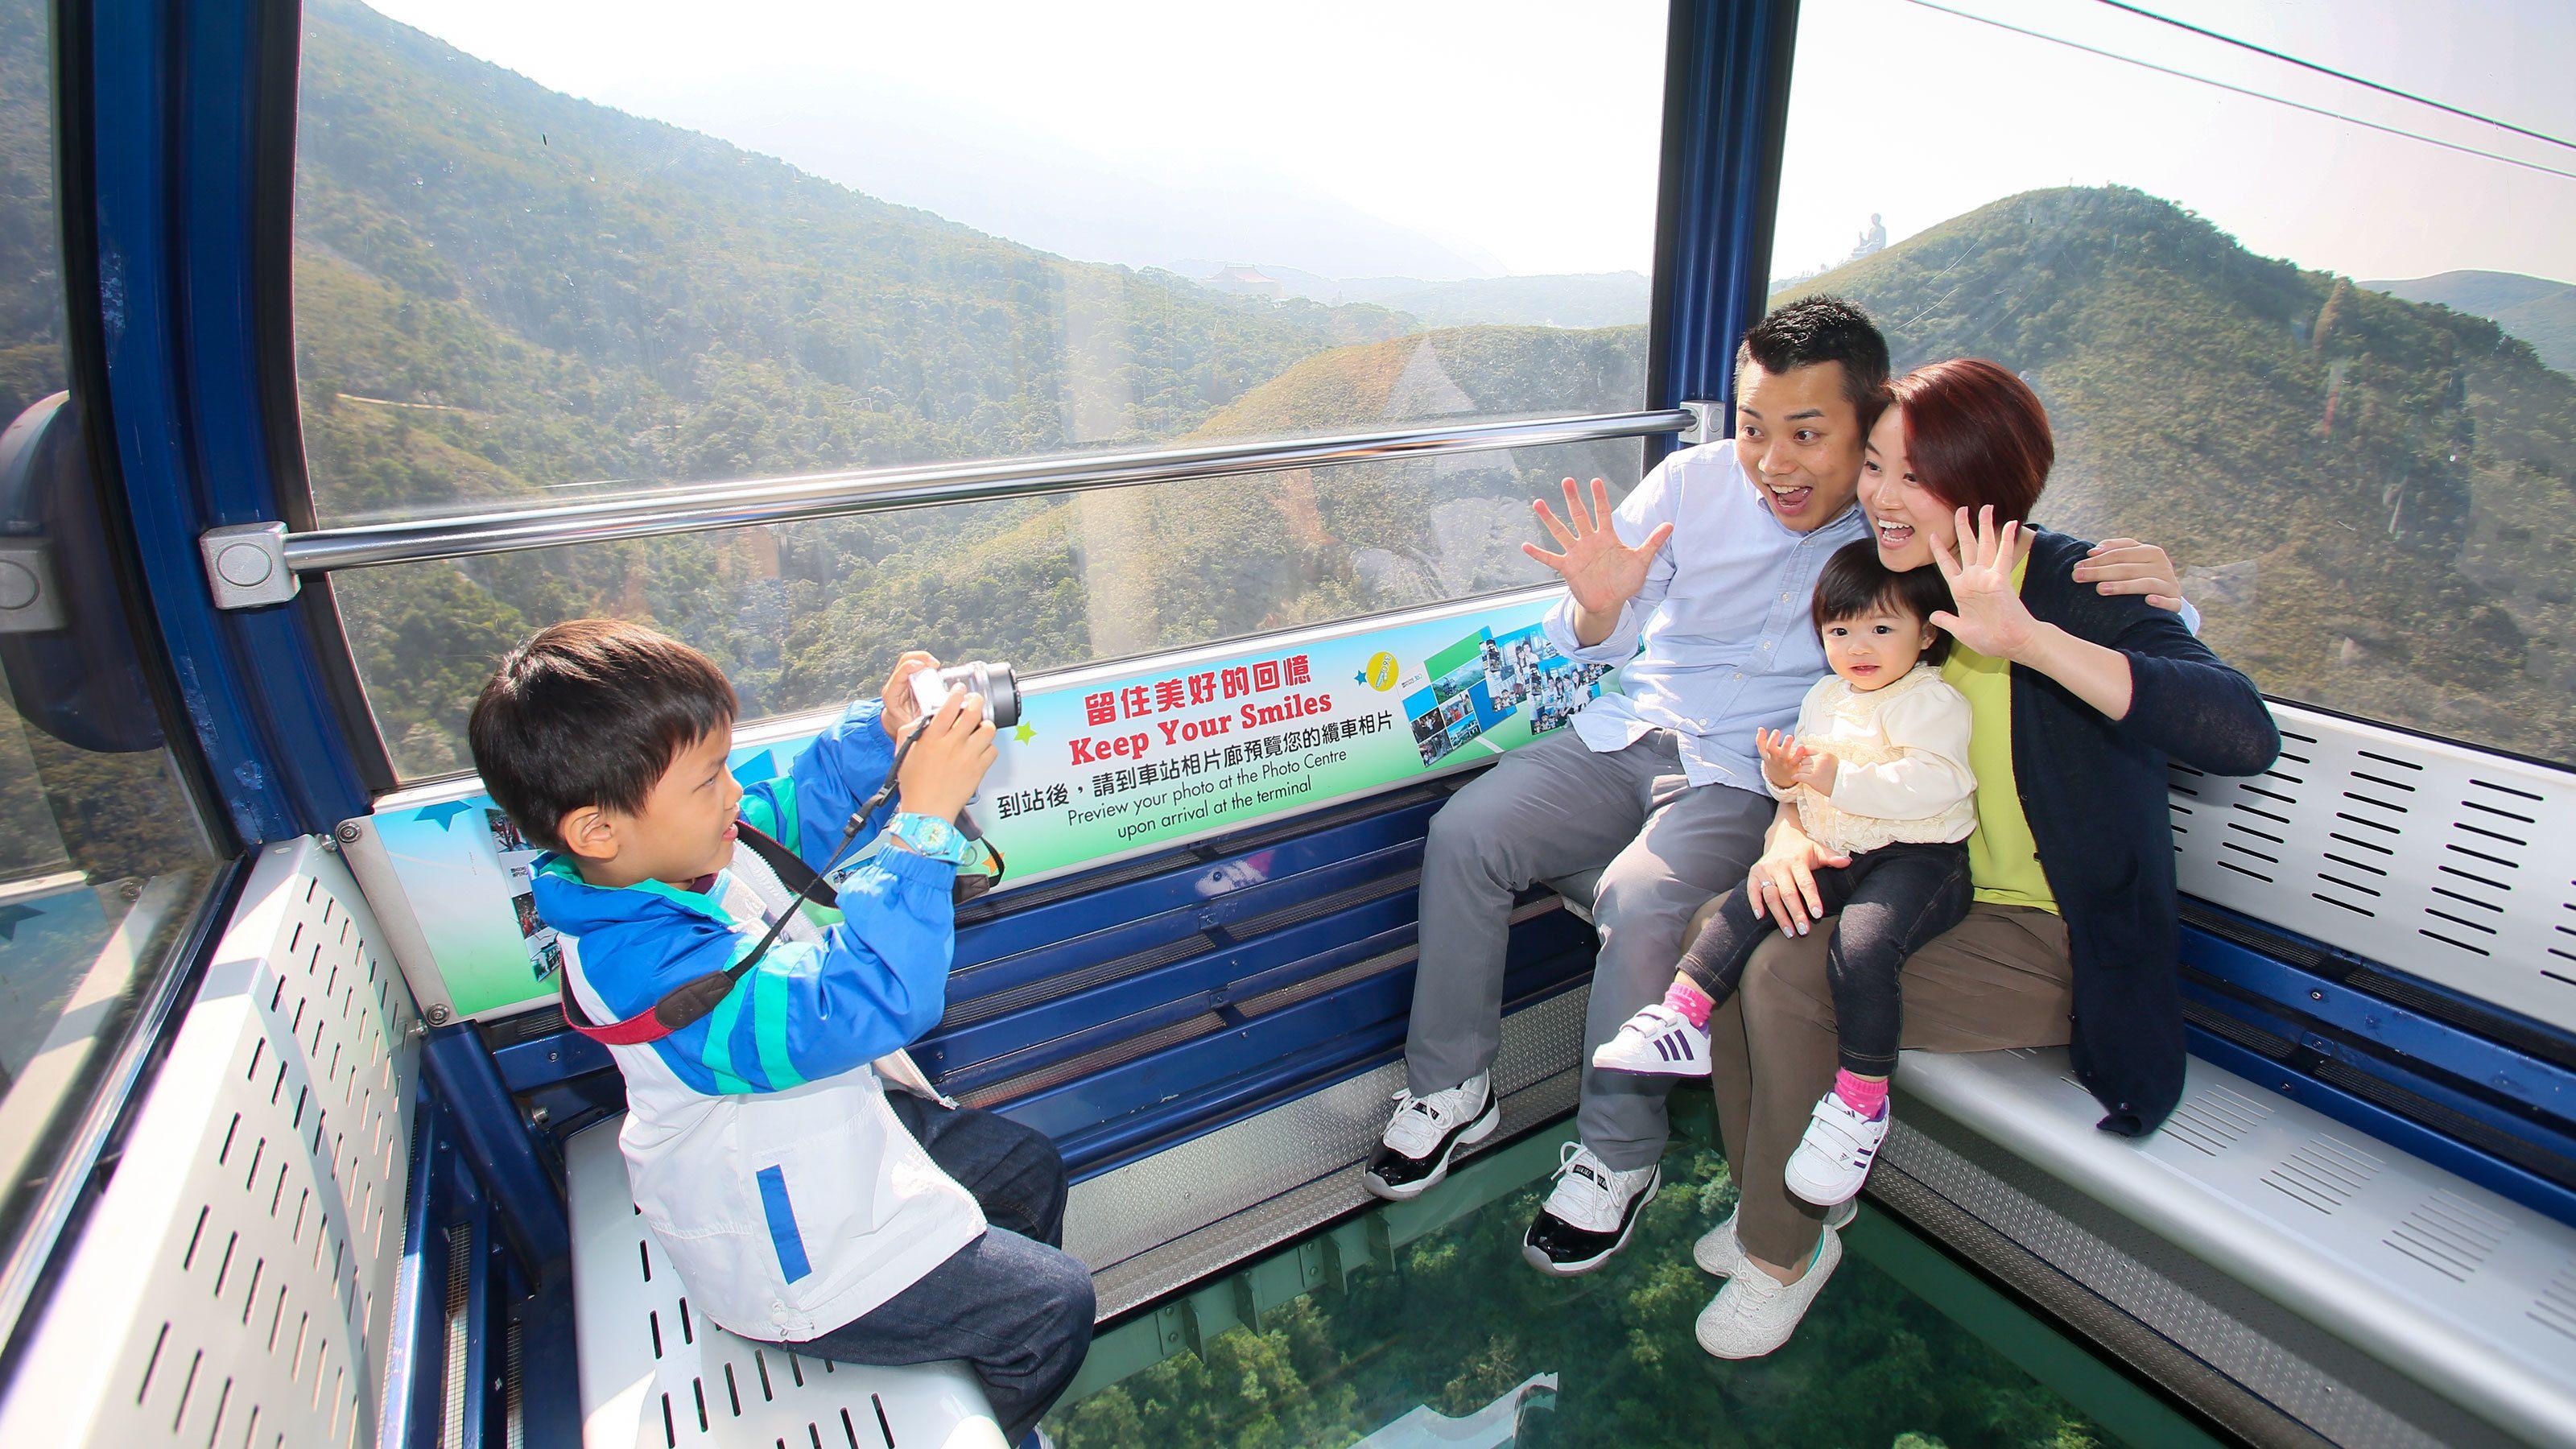 Family taking photos inside a cablecar.